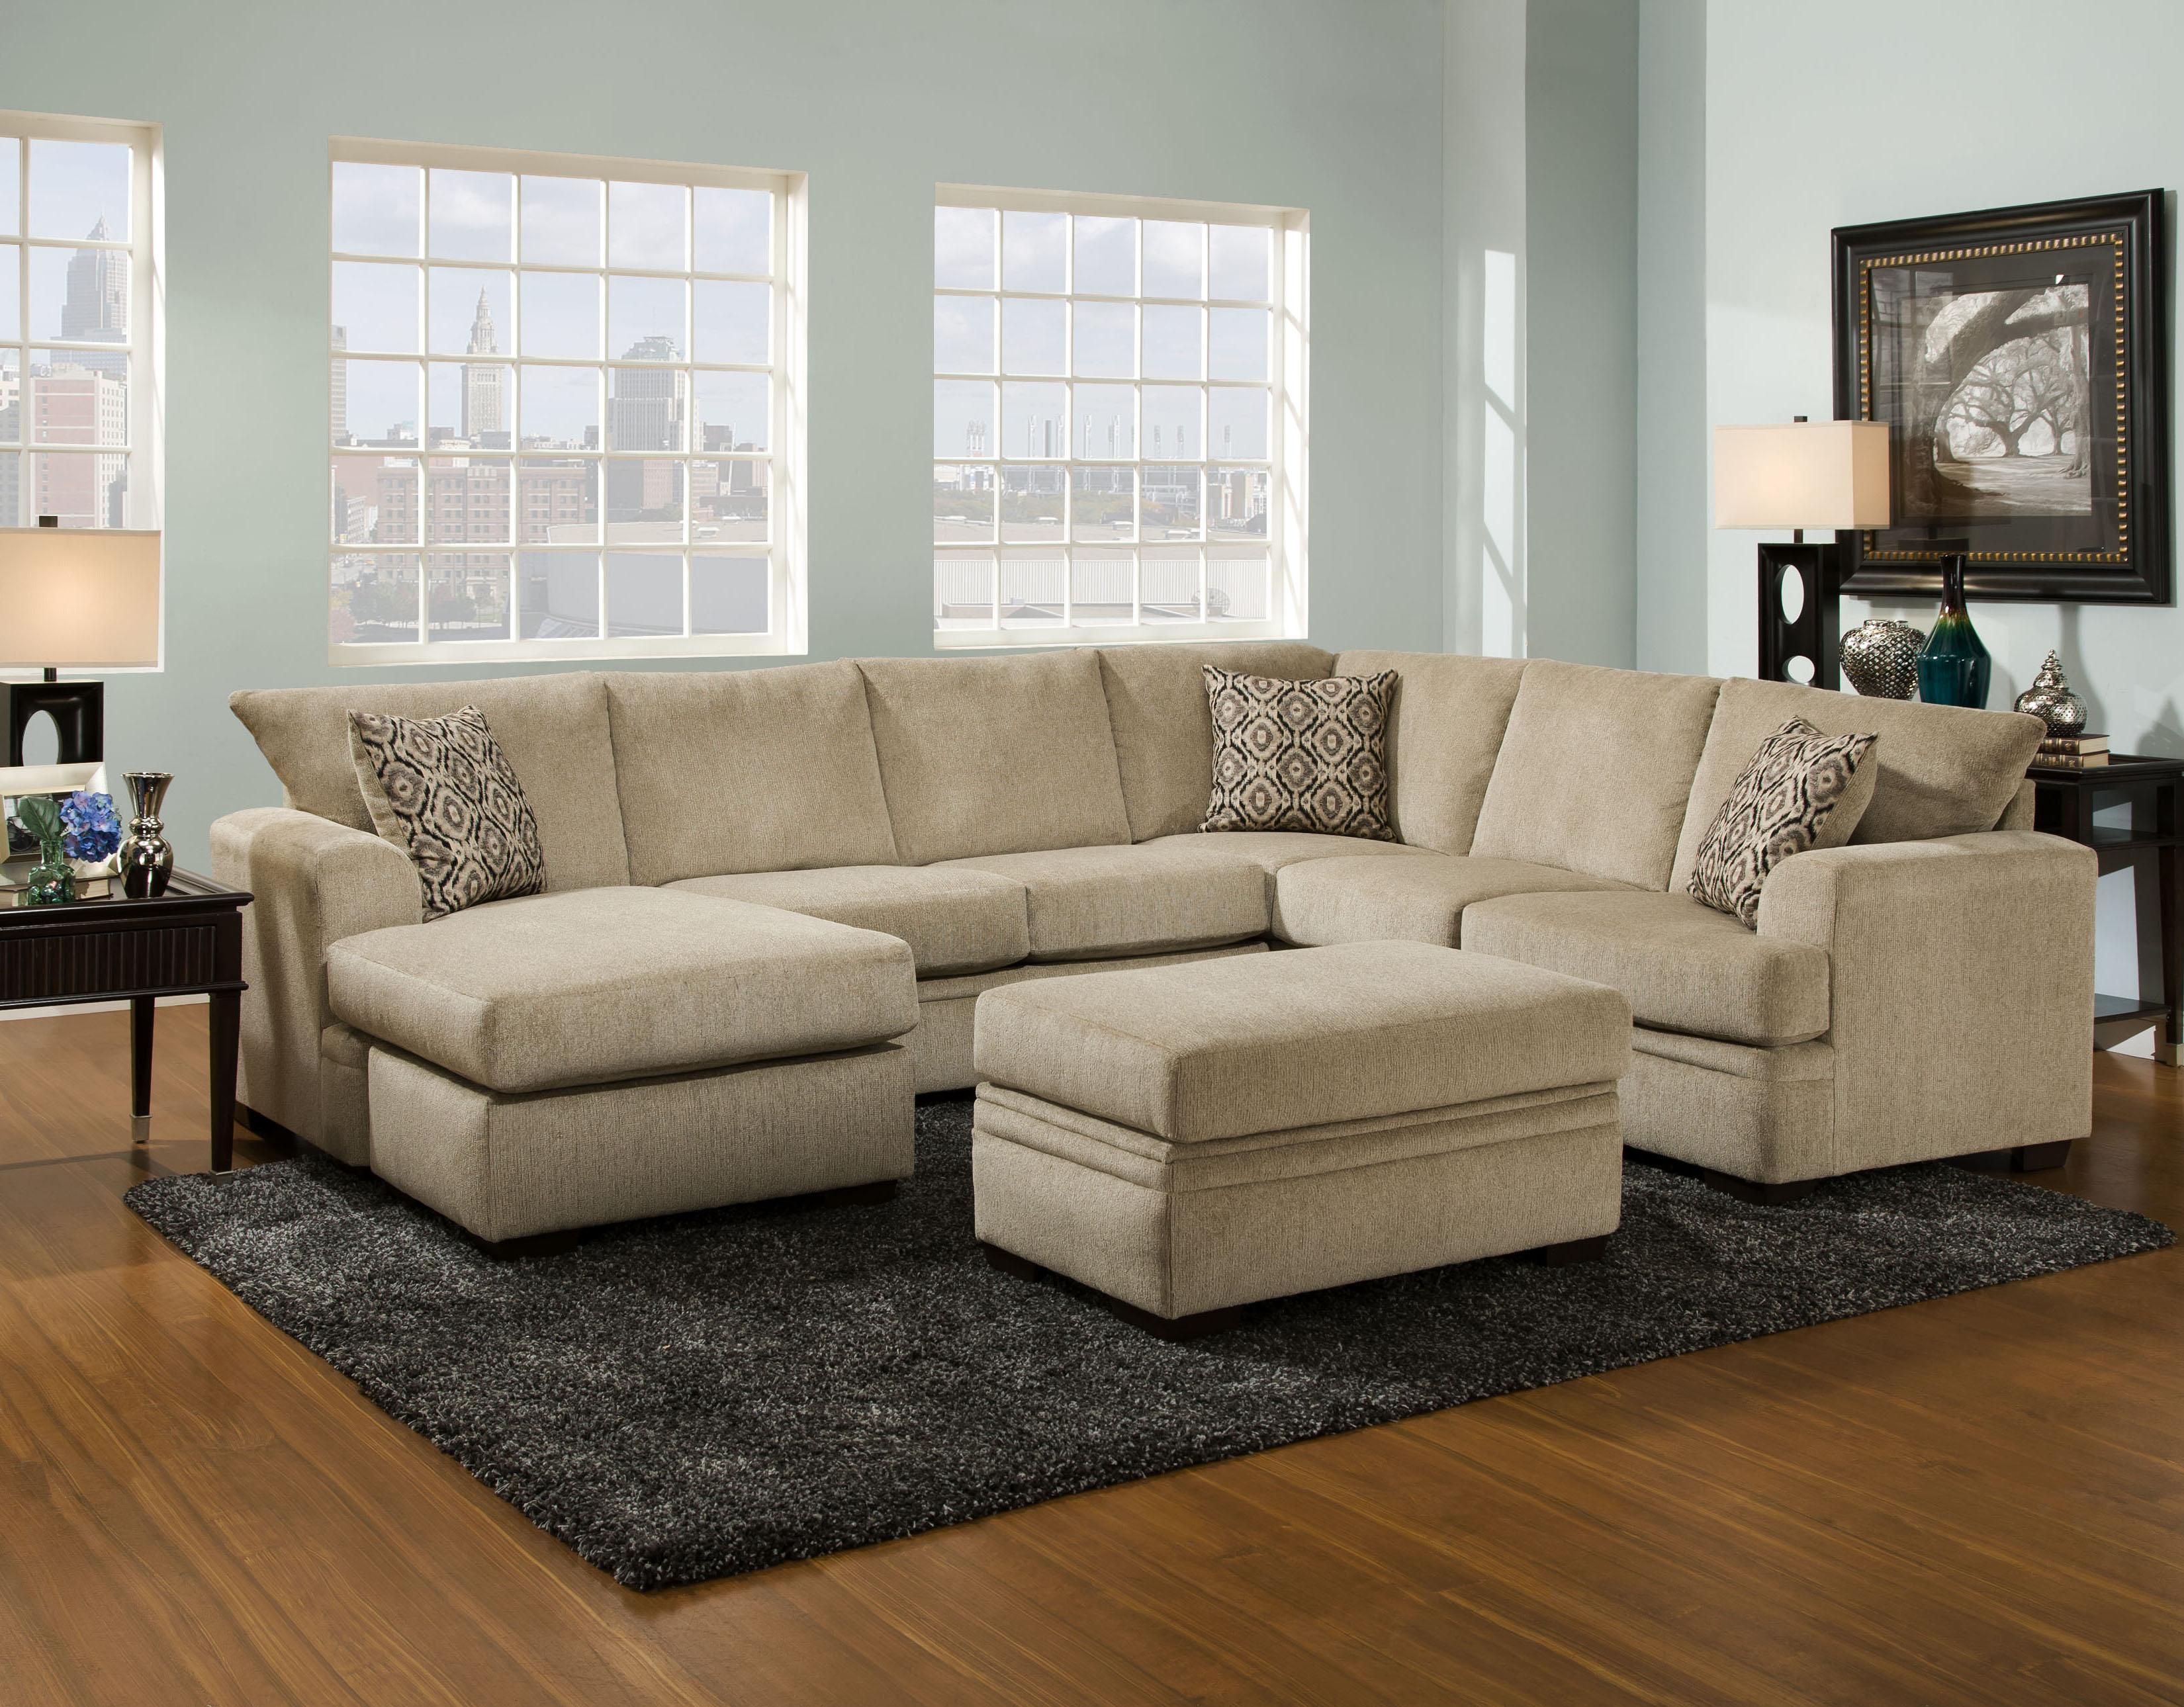 American furniture 6800 stationary living room group for American living room furniture